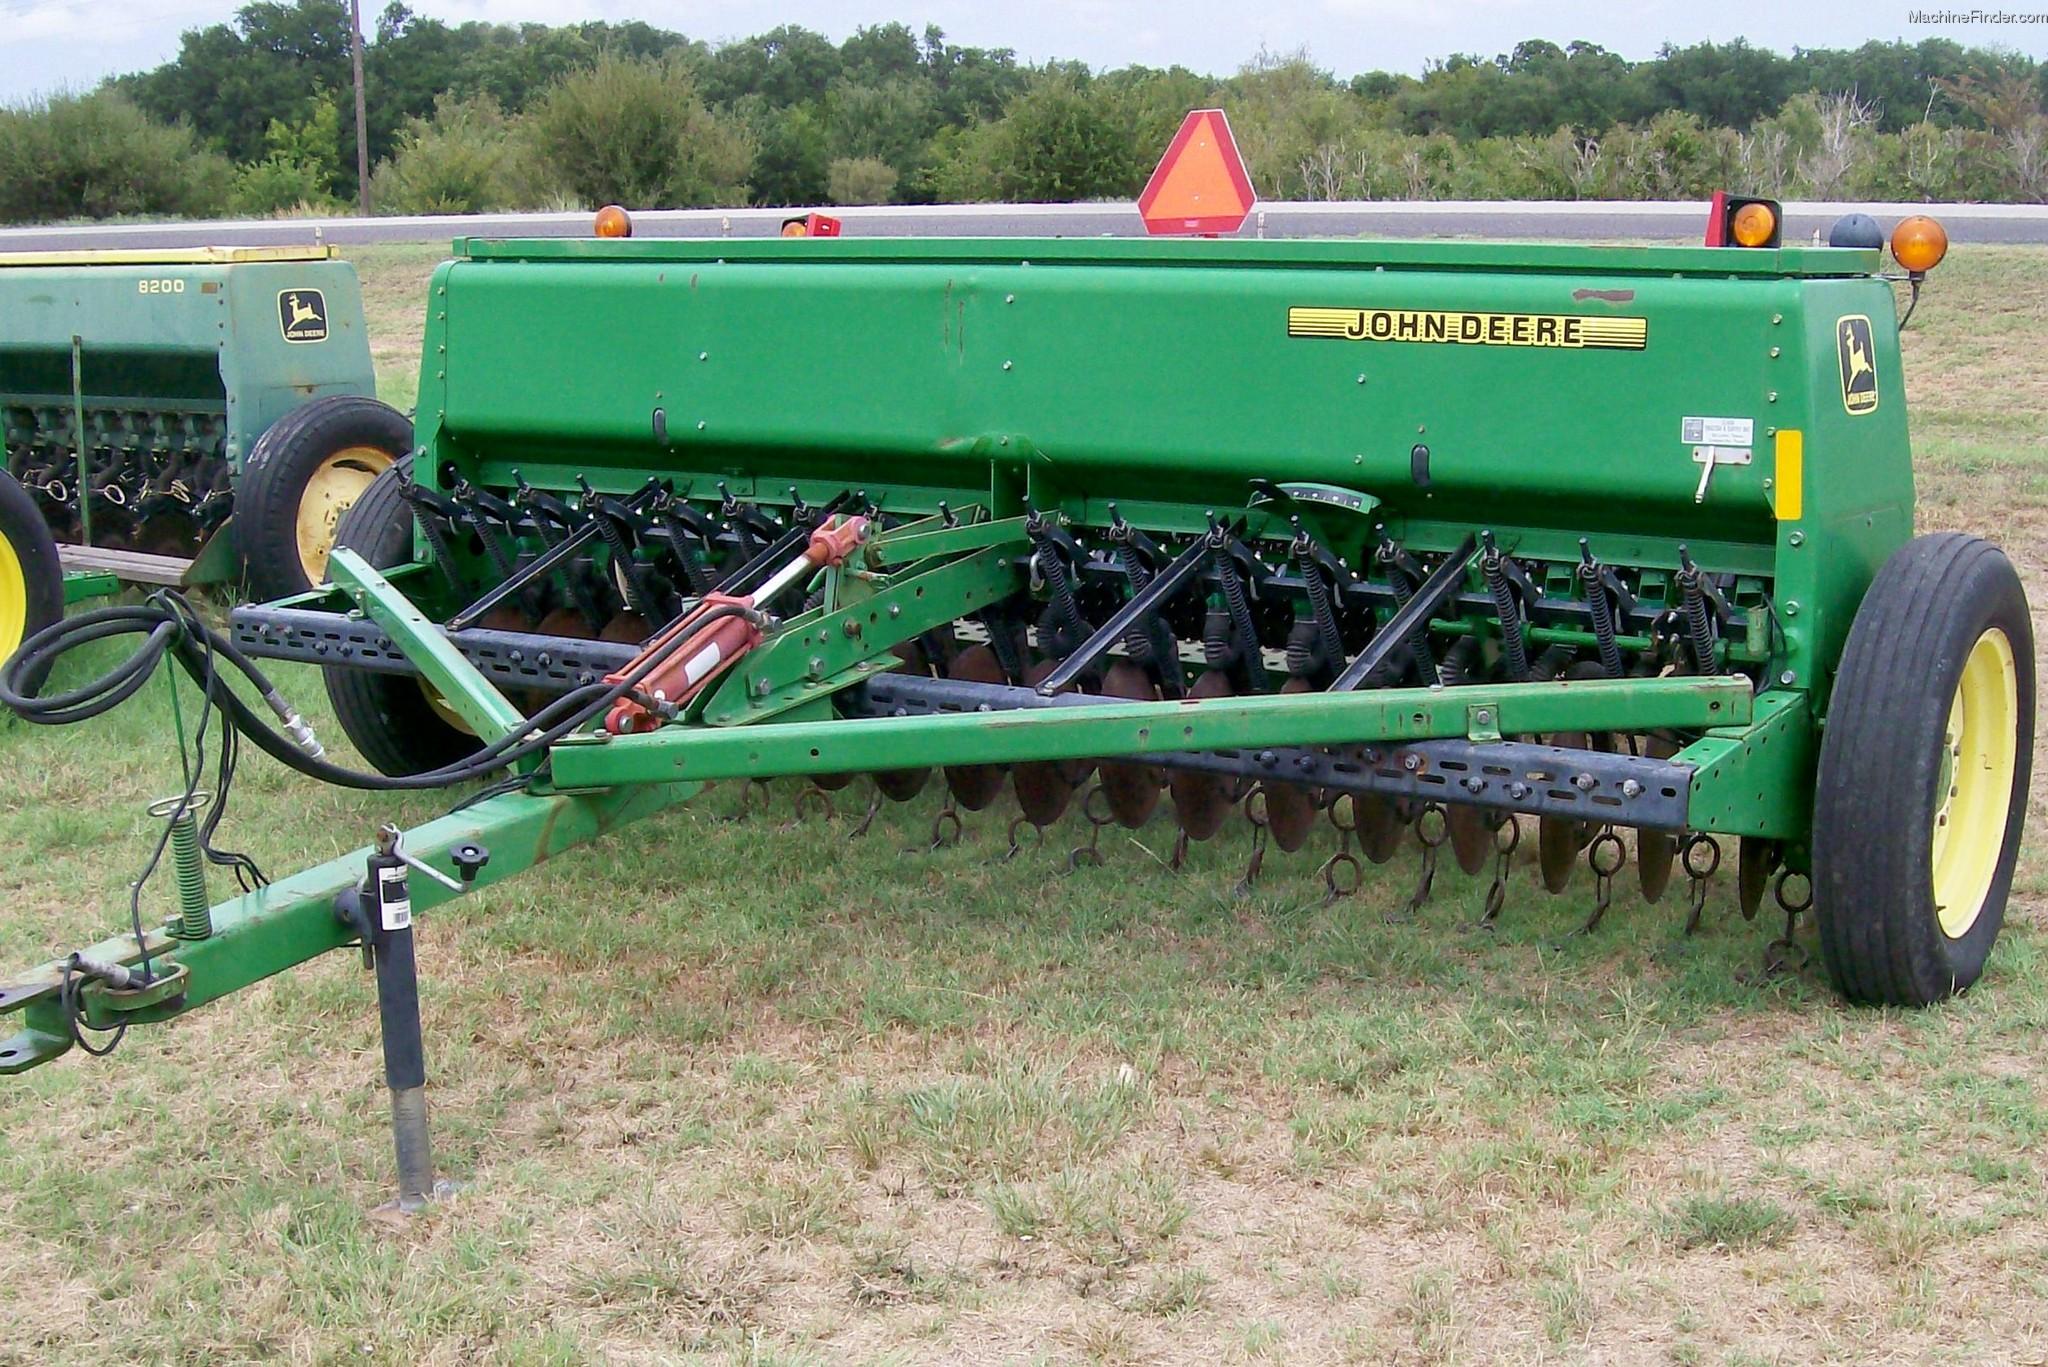 1997 John Deere 450 Planting & Seeding - Box Drills - John ...